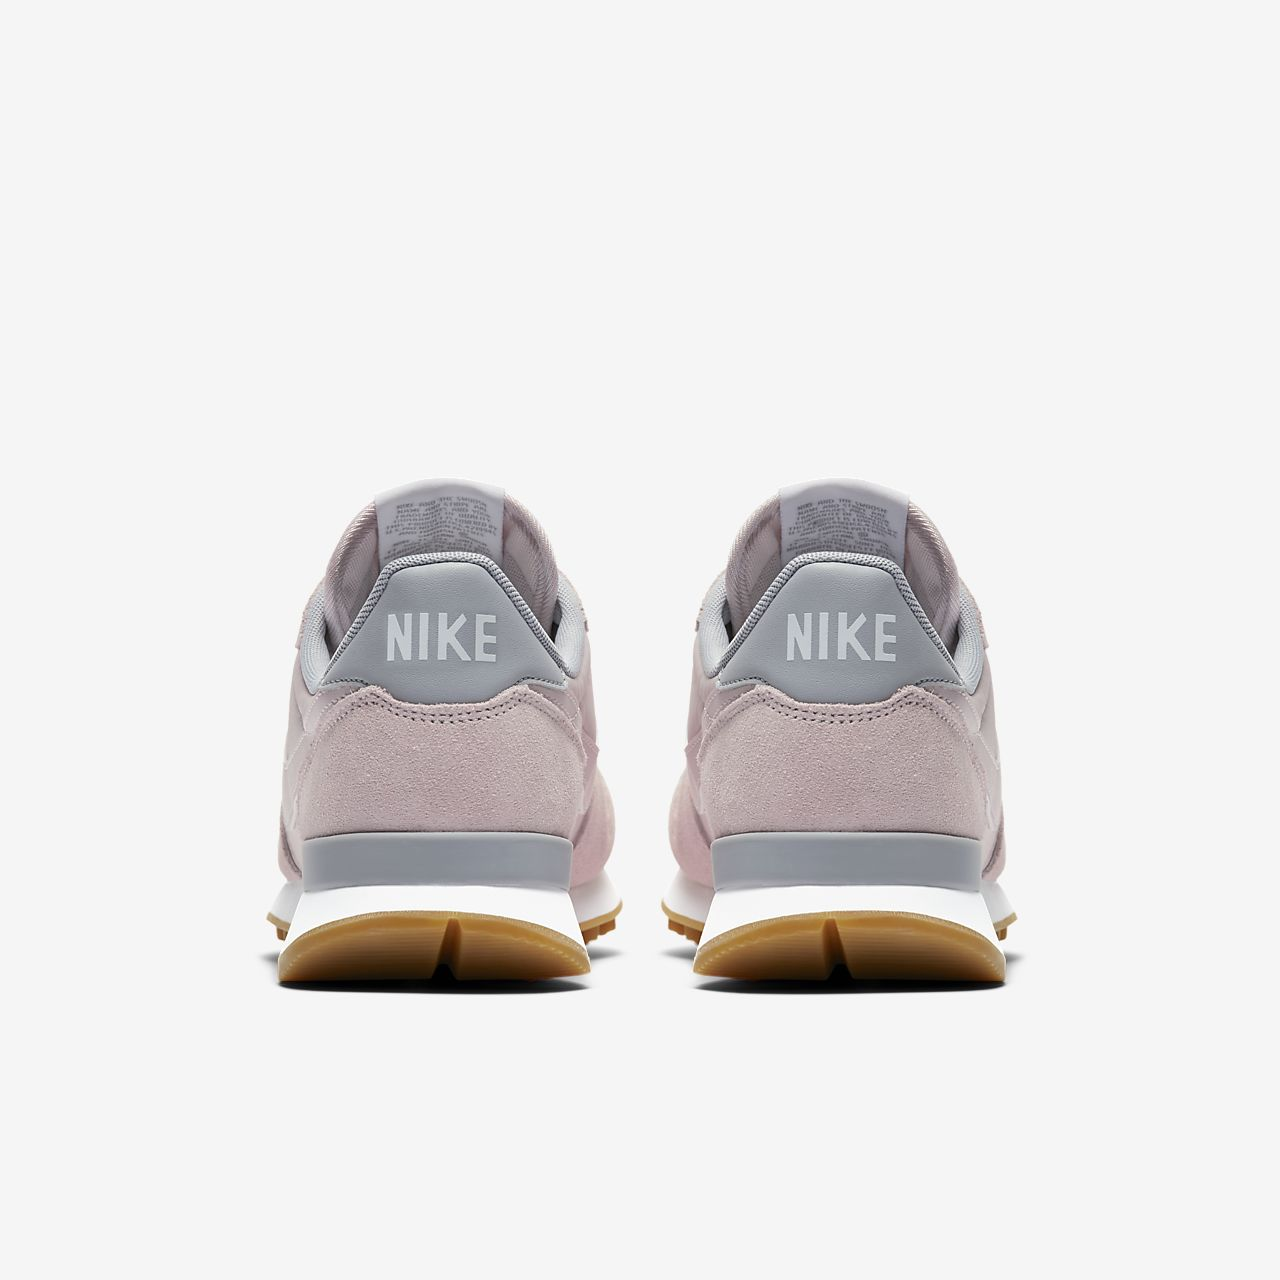 buy popular f1019 19d3a Low Resolution Nike Internationalist Womens Shoe Nike Internationalist  Womens Shoe